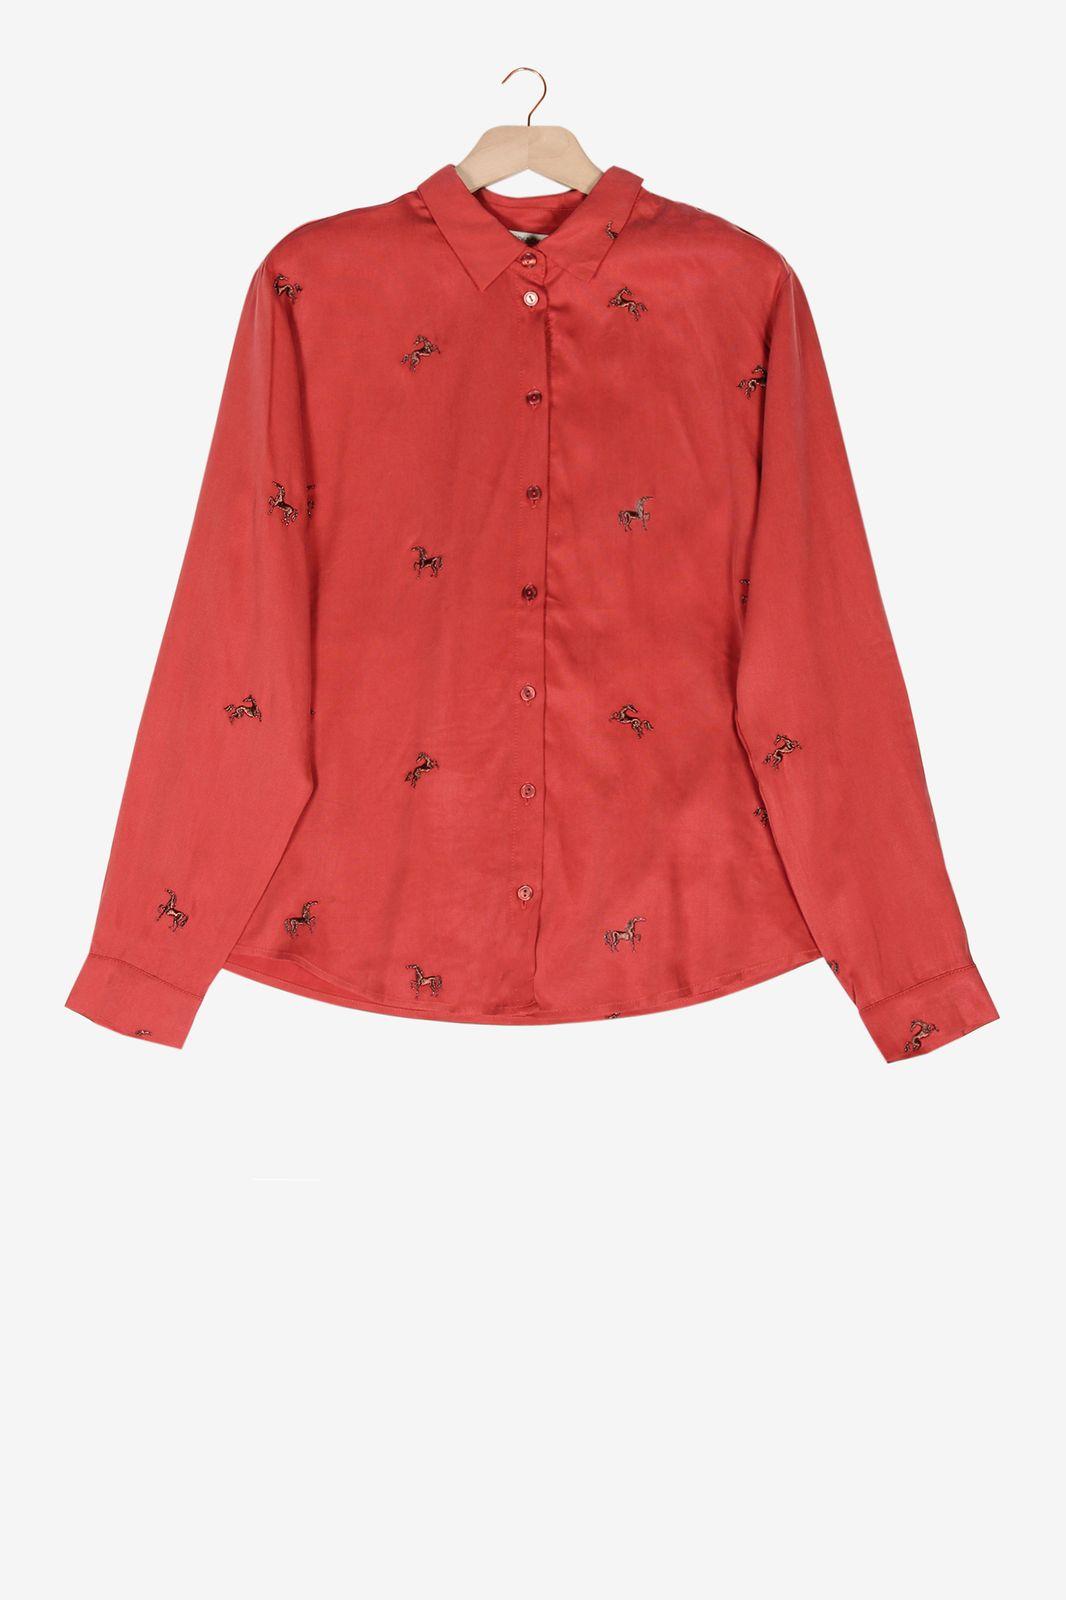 Rode blouse met paarden - Dames | Sissy-Boy